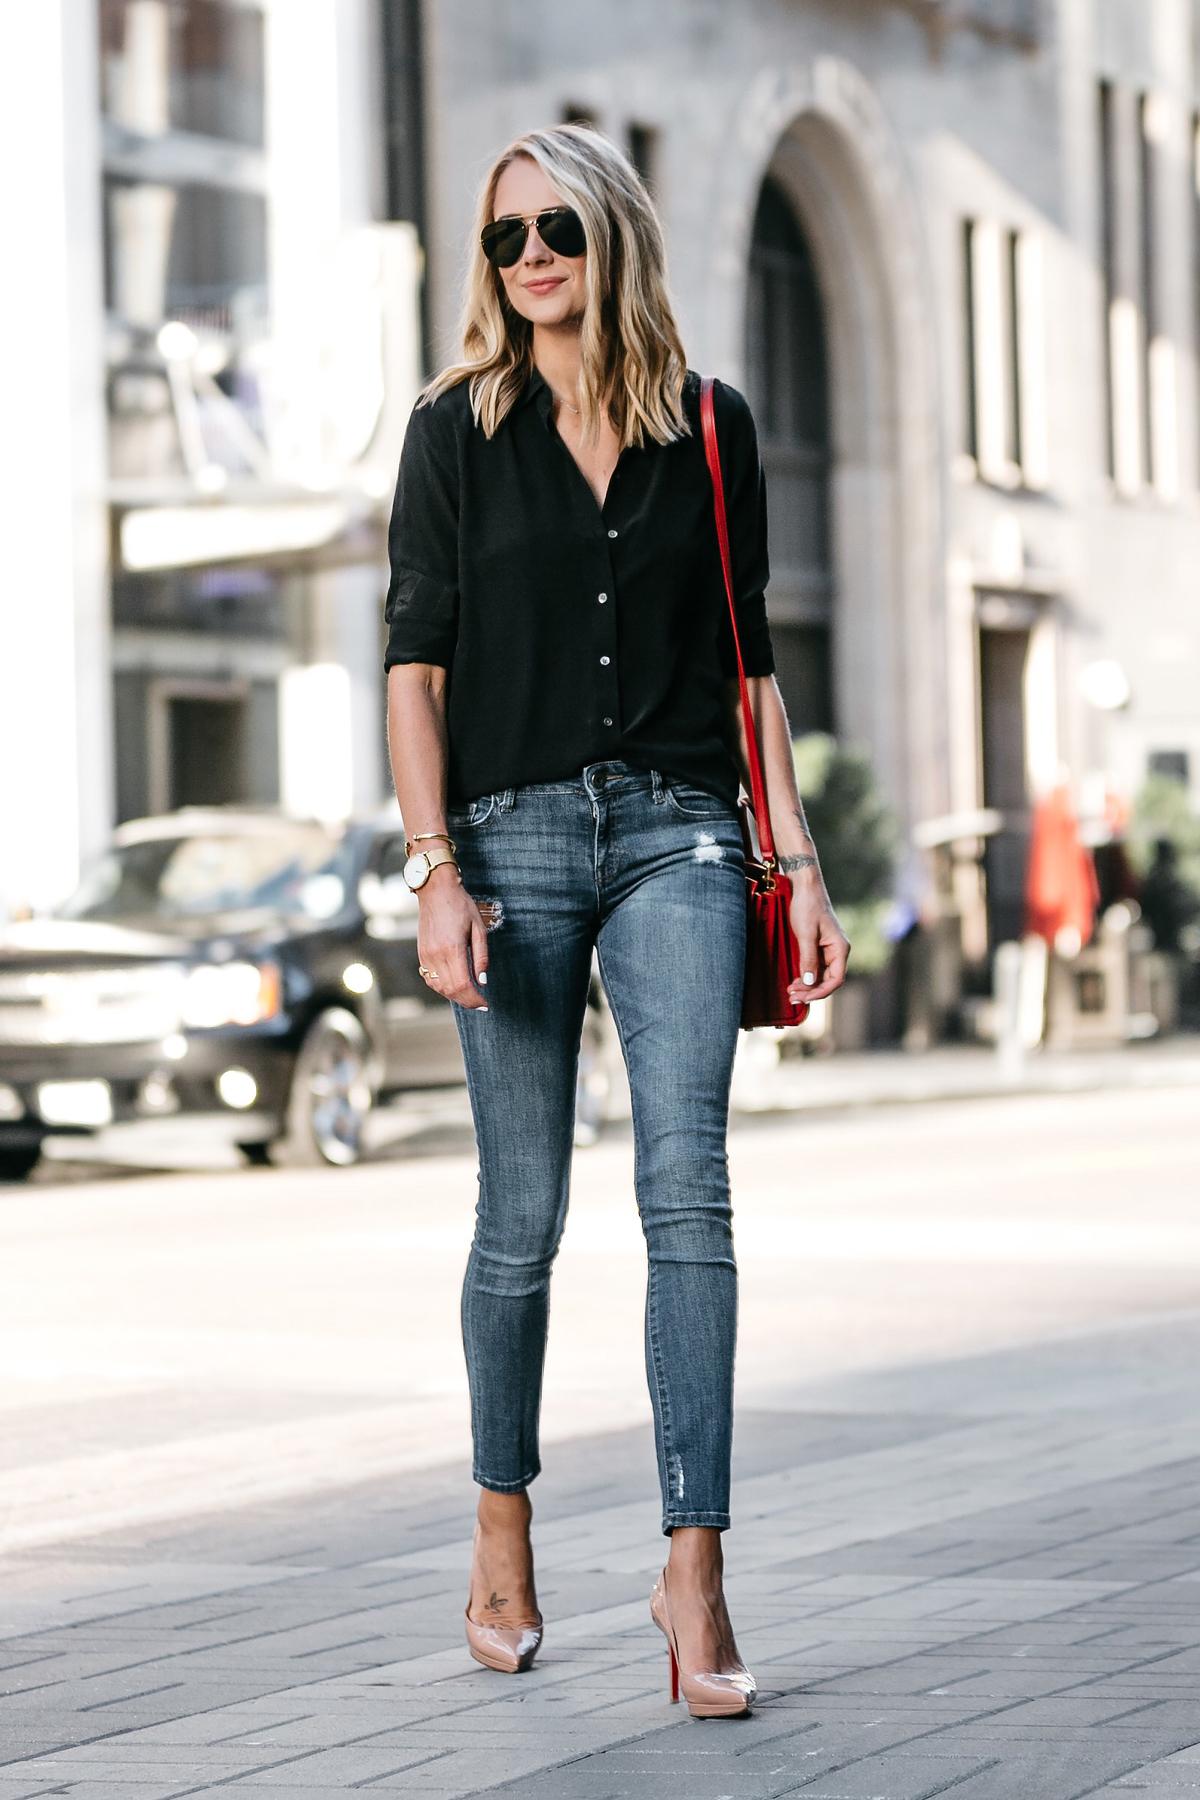 Blonde Wearing Everlane Black Button Up Shirt Denim Skinny Jeans Outfit Christian Louboutin Nude Pumps Red Handbag Fashion Jackson Dallas Blogger Fashion Blogger Street Style